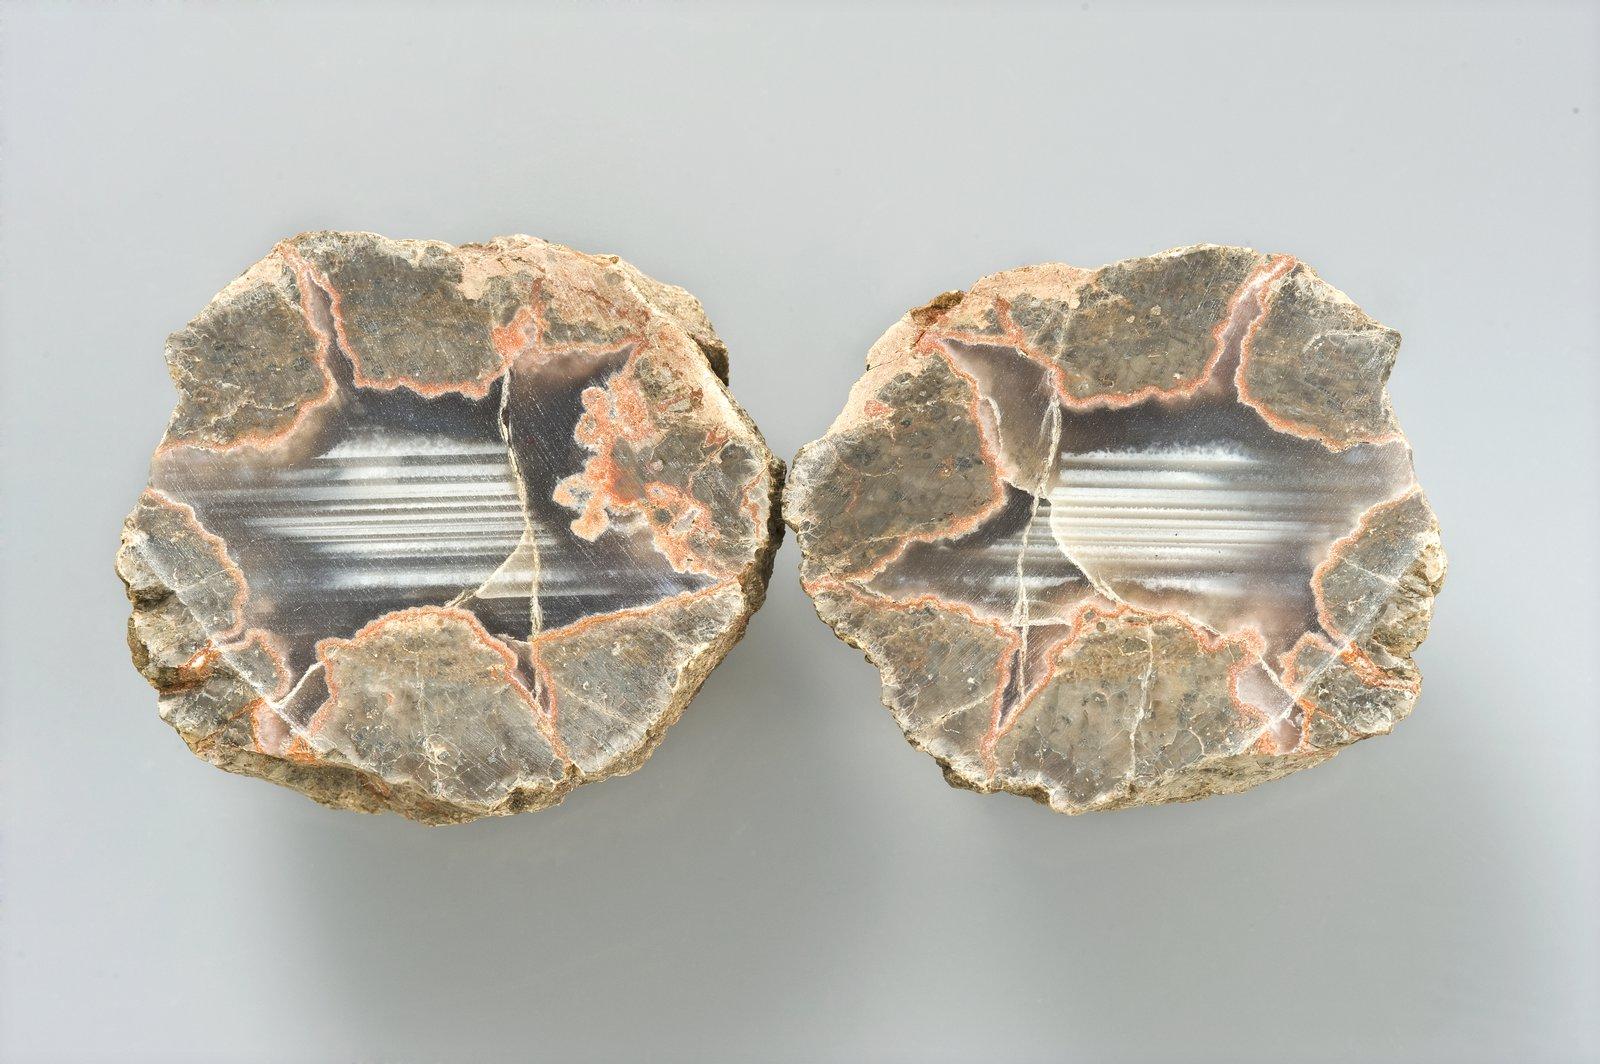 Agate nodule